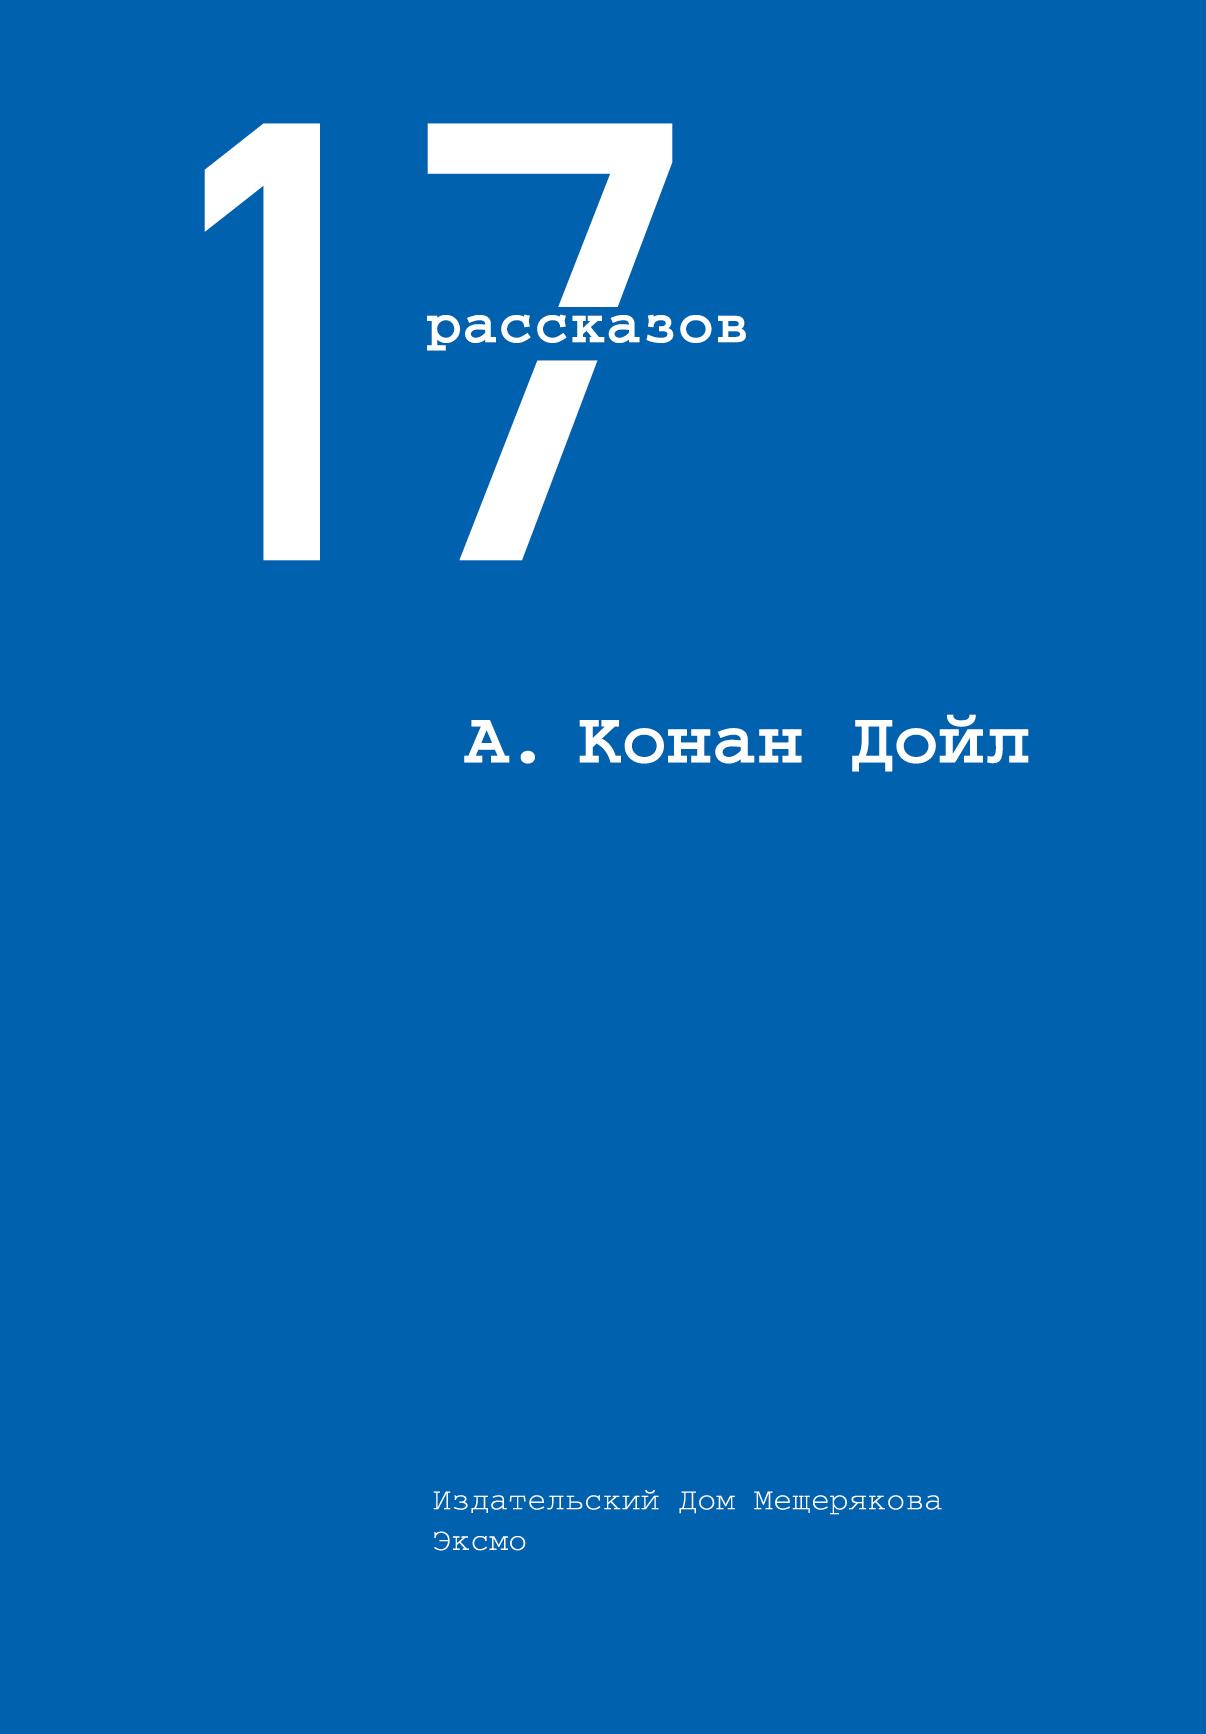 А. Конан Дойл. 17 рассказов